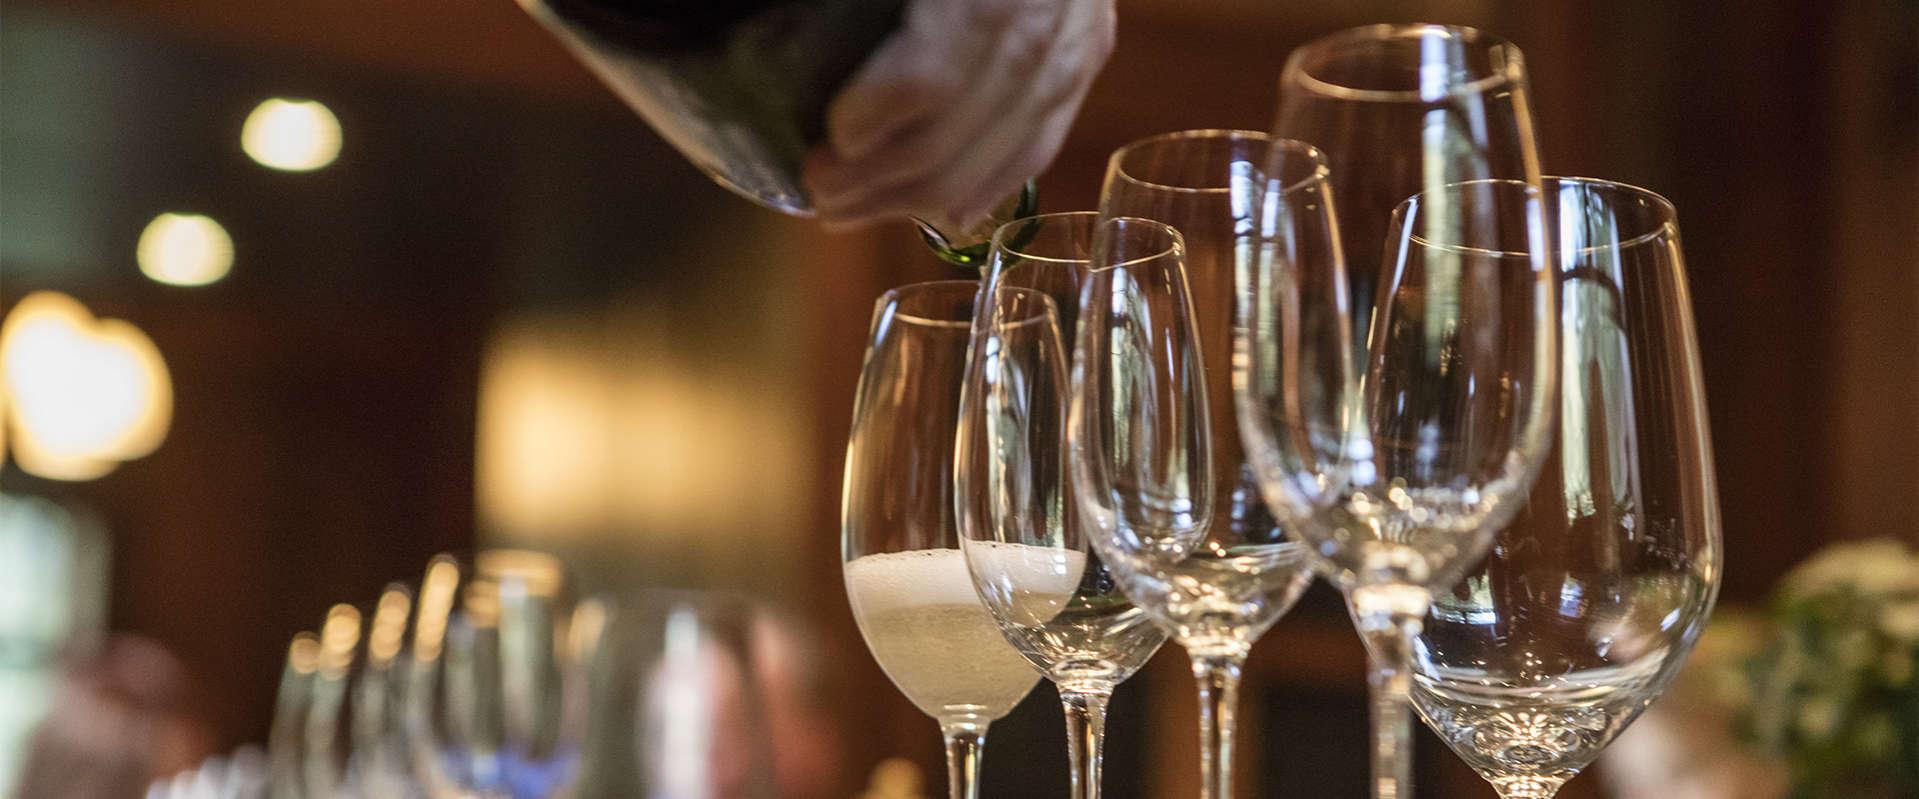 Schramsberg sparkling wine being poured for a tasting